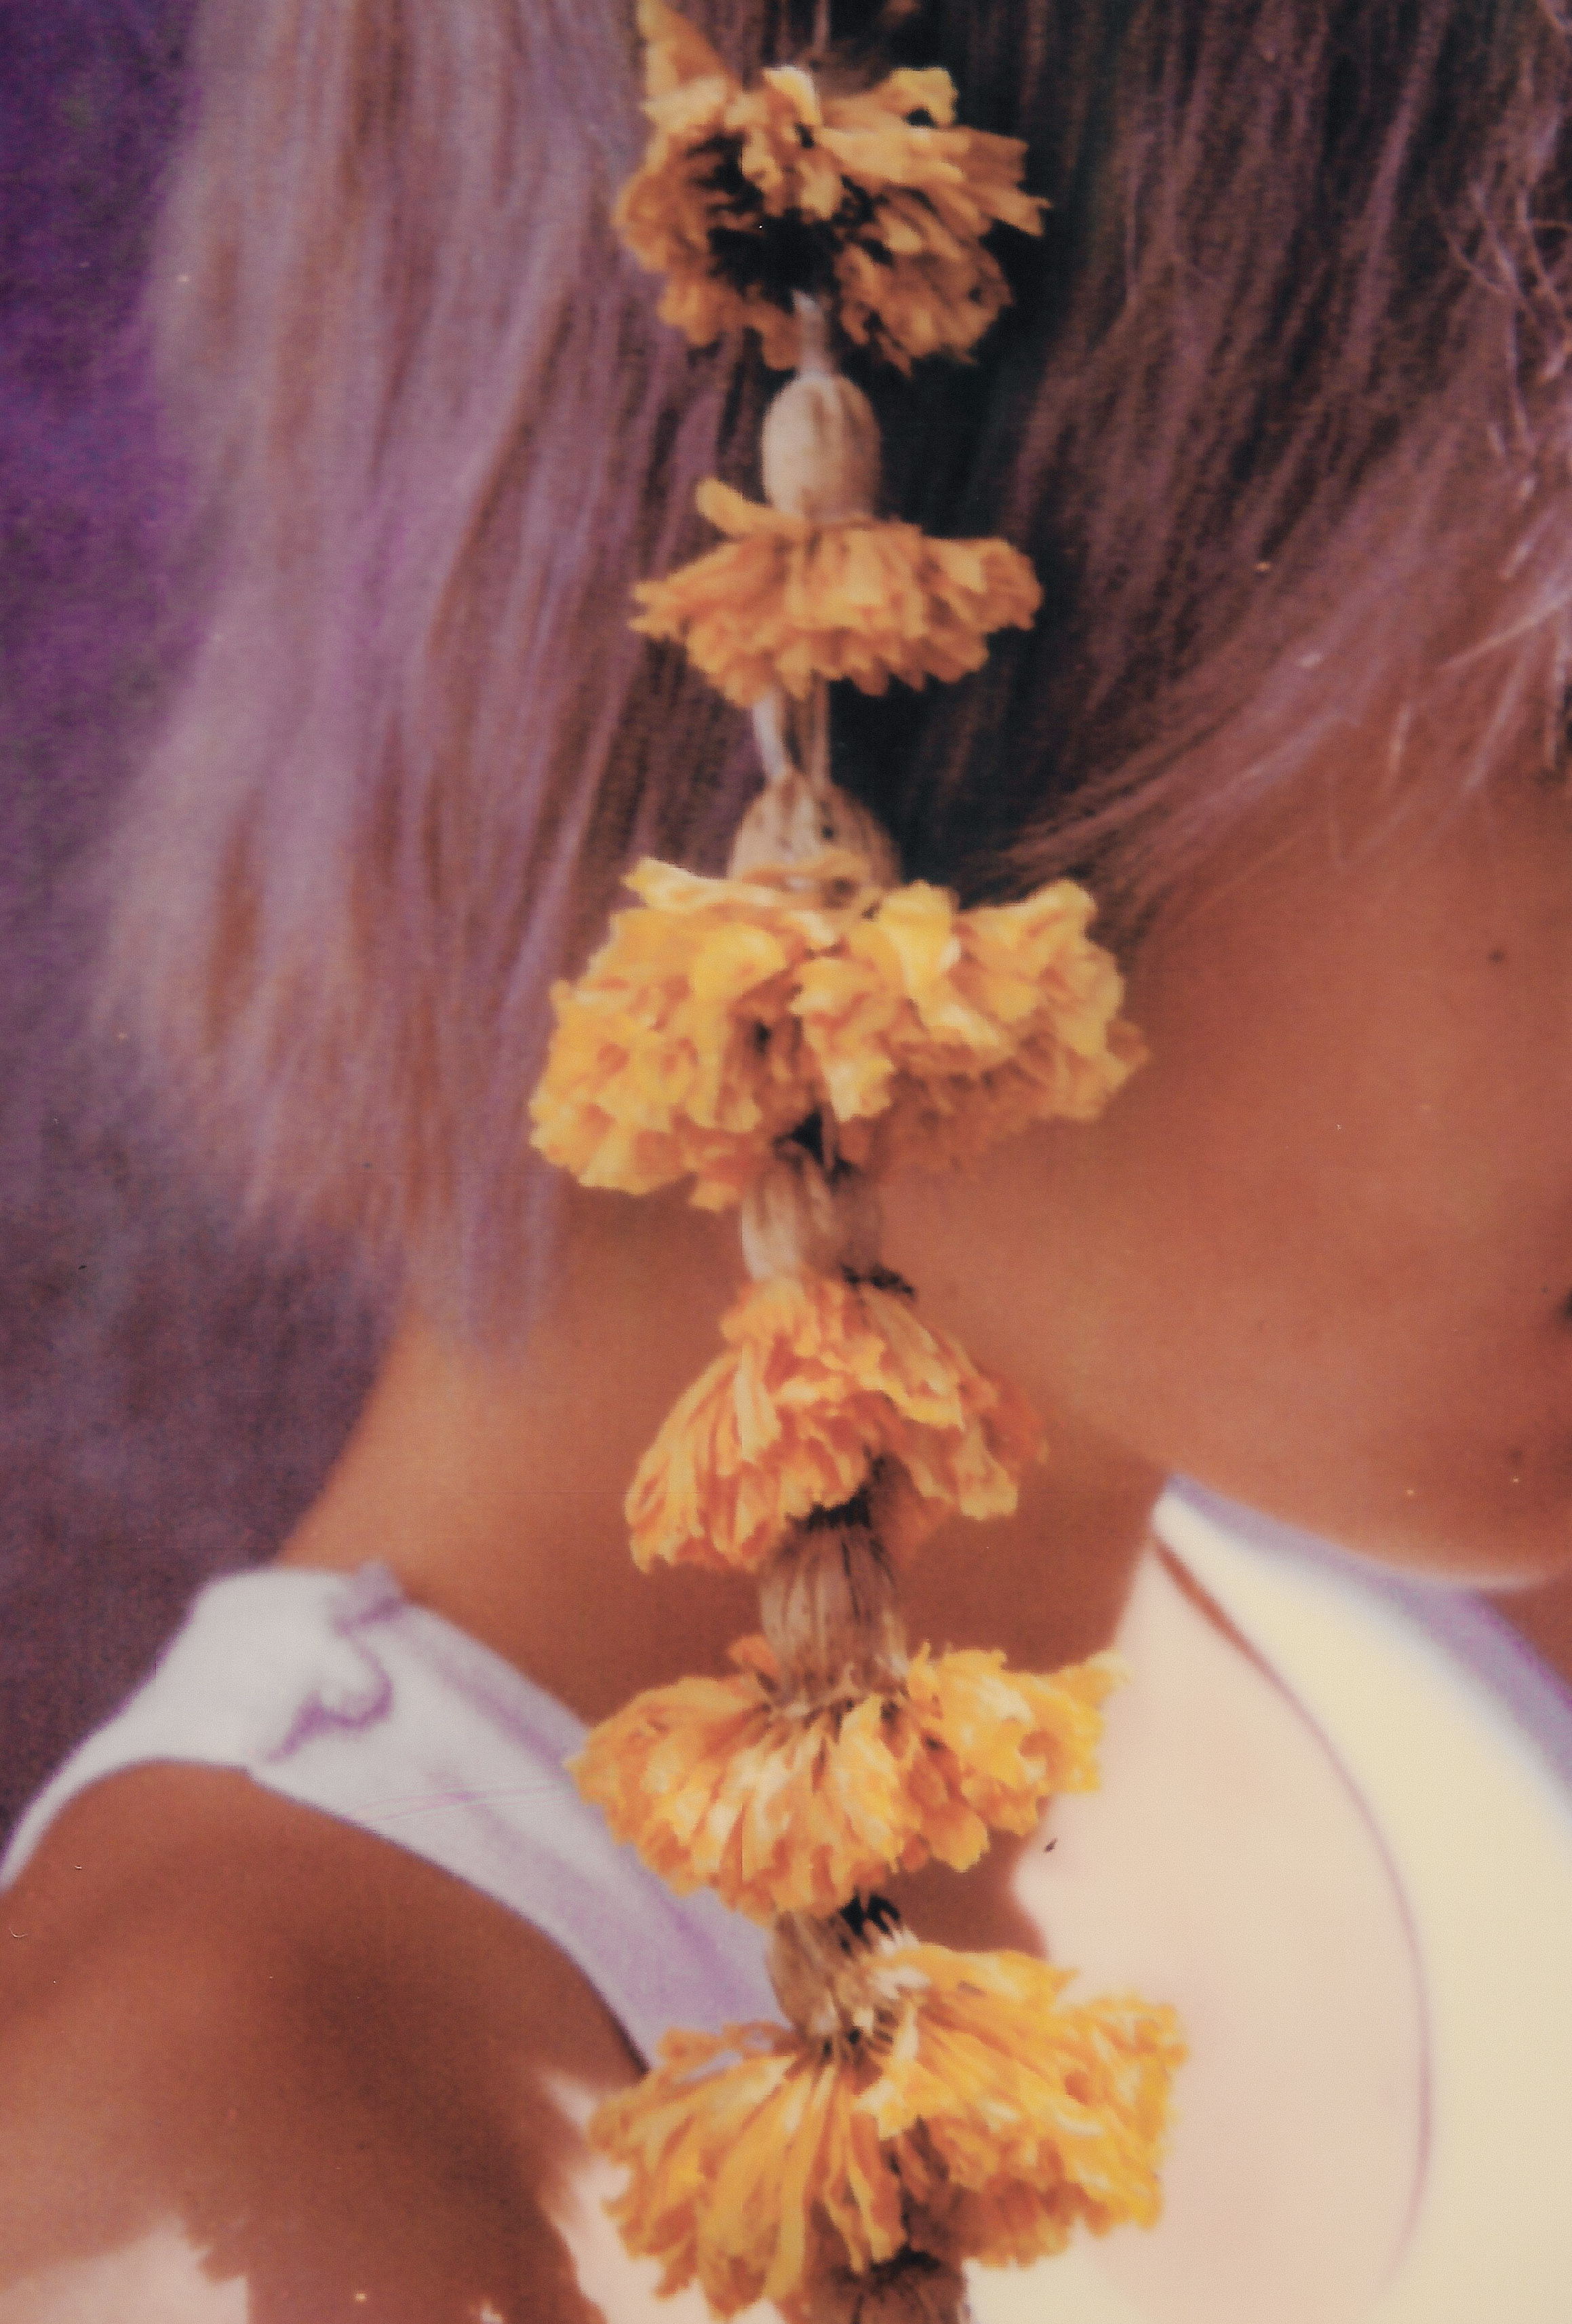 CJU Polaroid sx-70 Vermeer spring.jpg